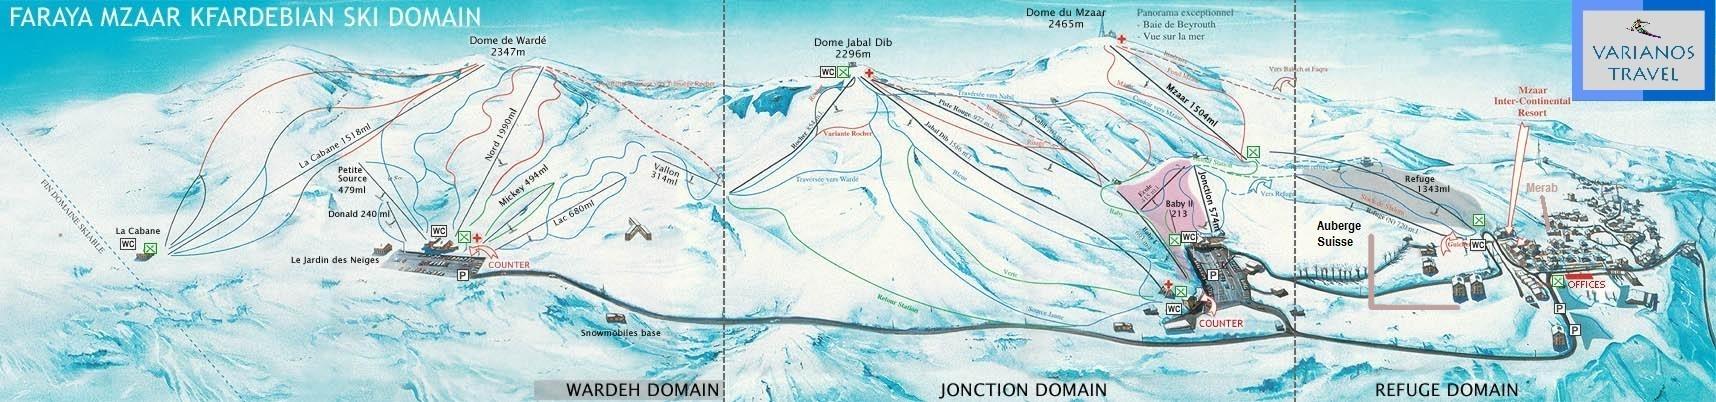 Faraya Mzaar Ski Map Lebanon Middle East